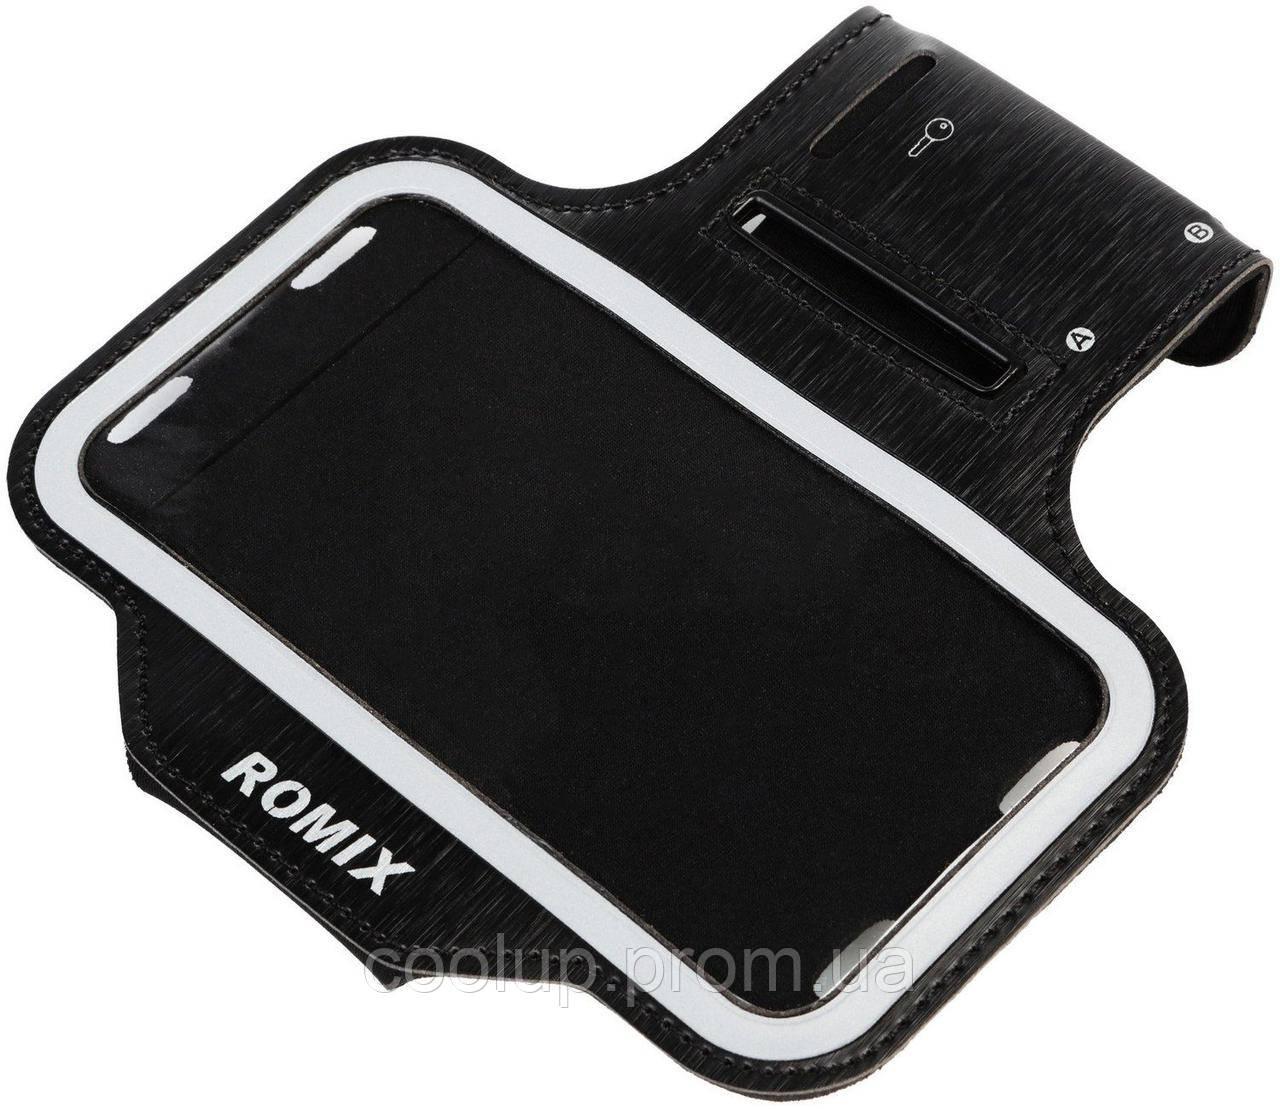 Чехол на руку Romix RH07 Touch Screen Armband Case 4.7 Black, фото 1